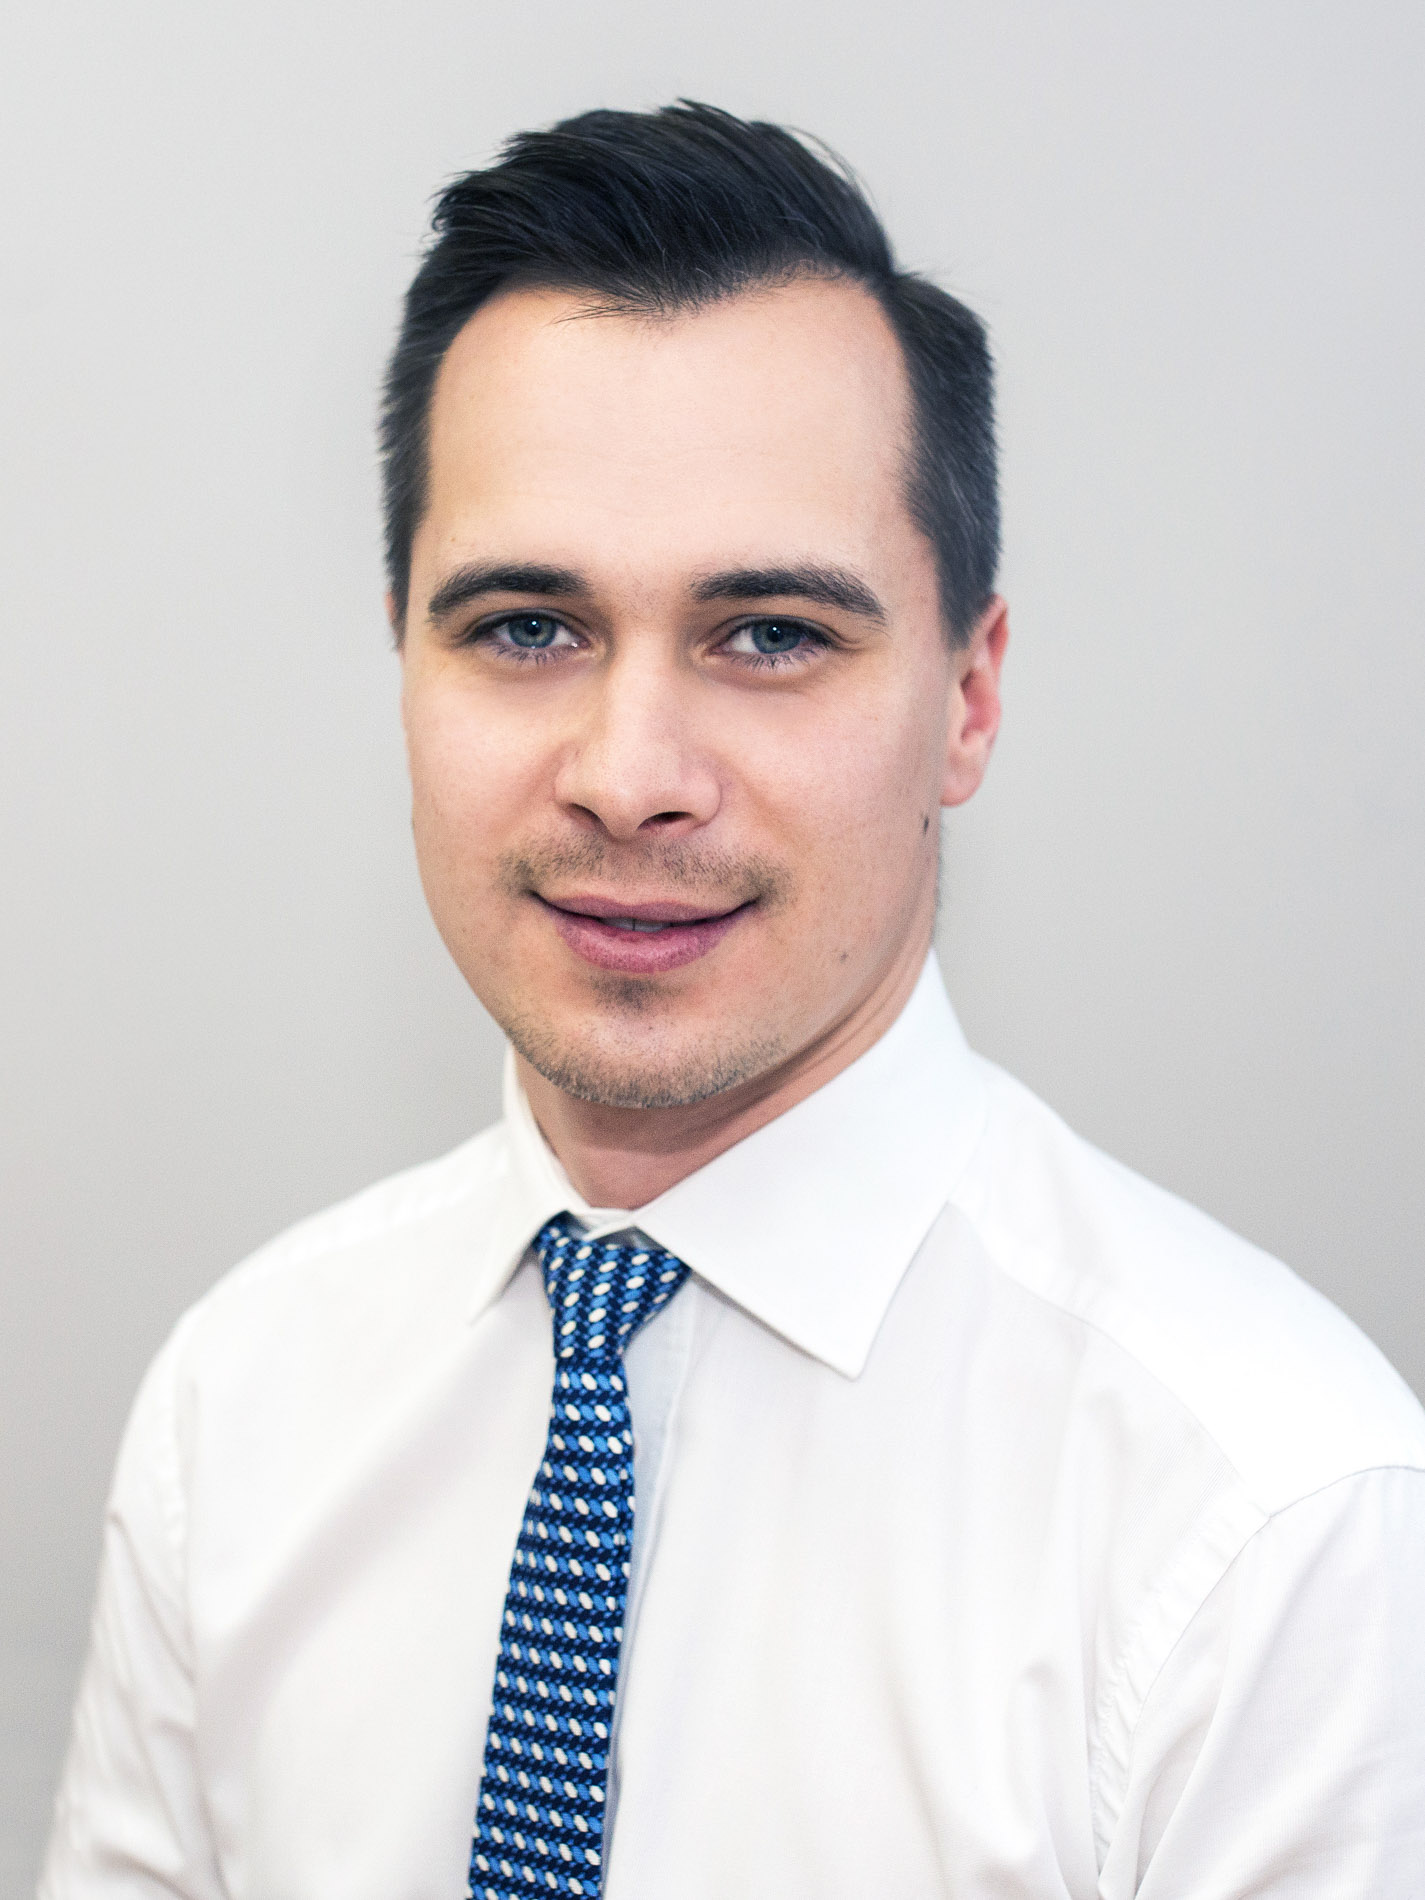 Piotr Mazurek